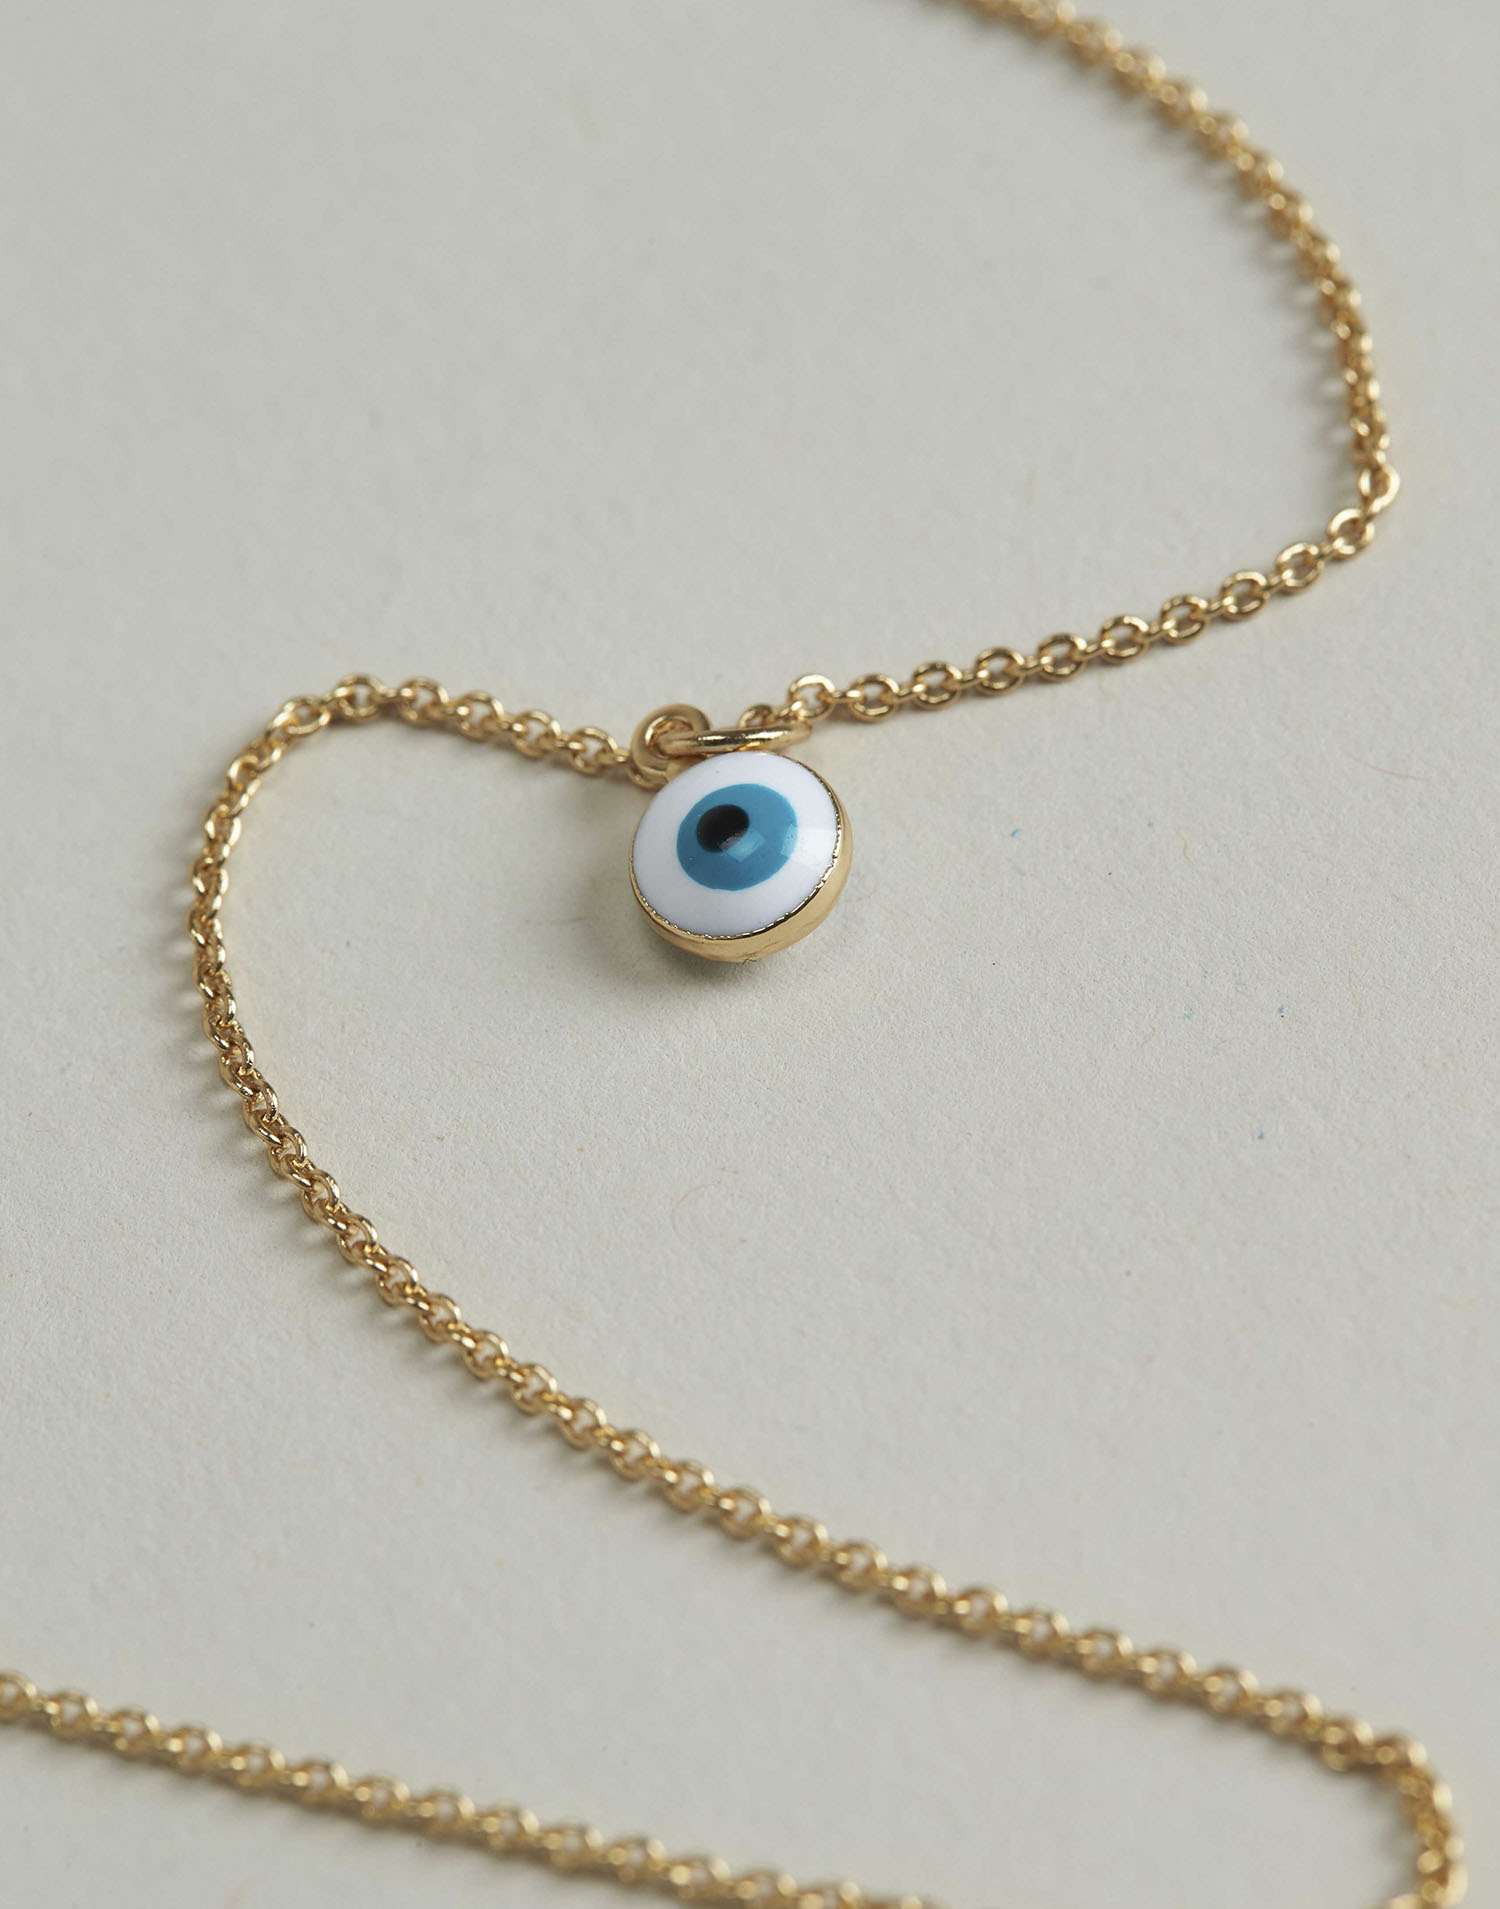 Evil's eye pendant necklace